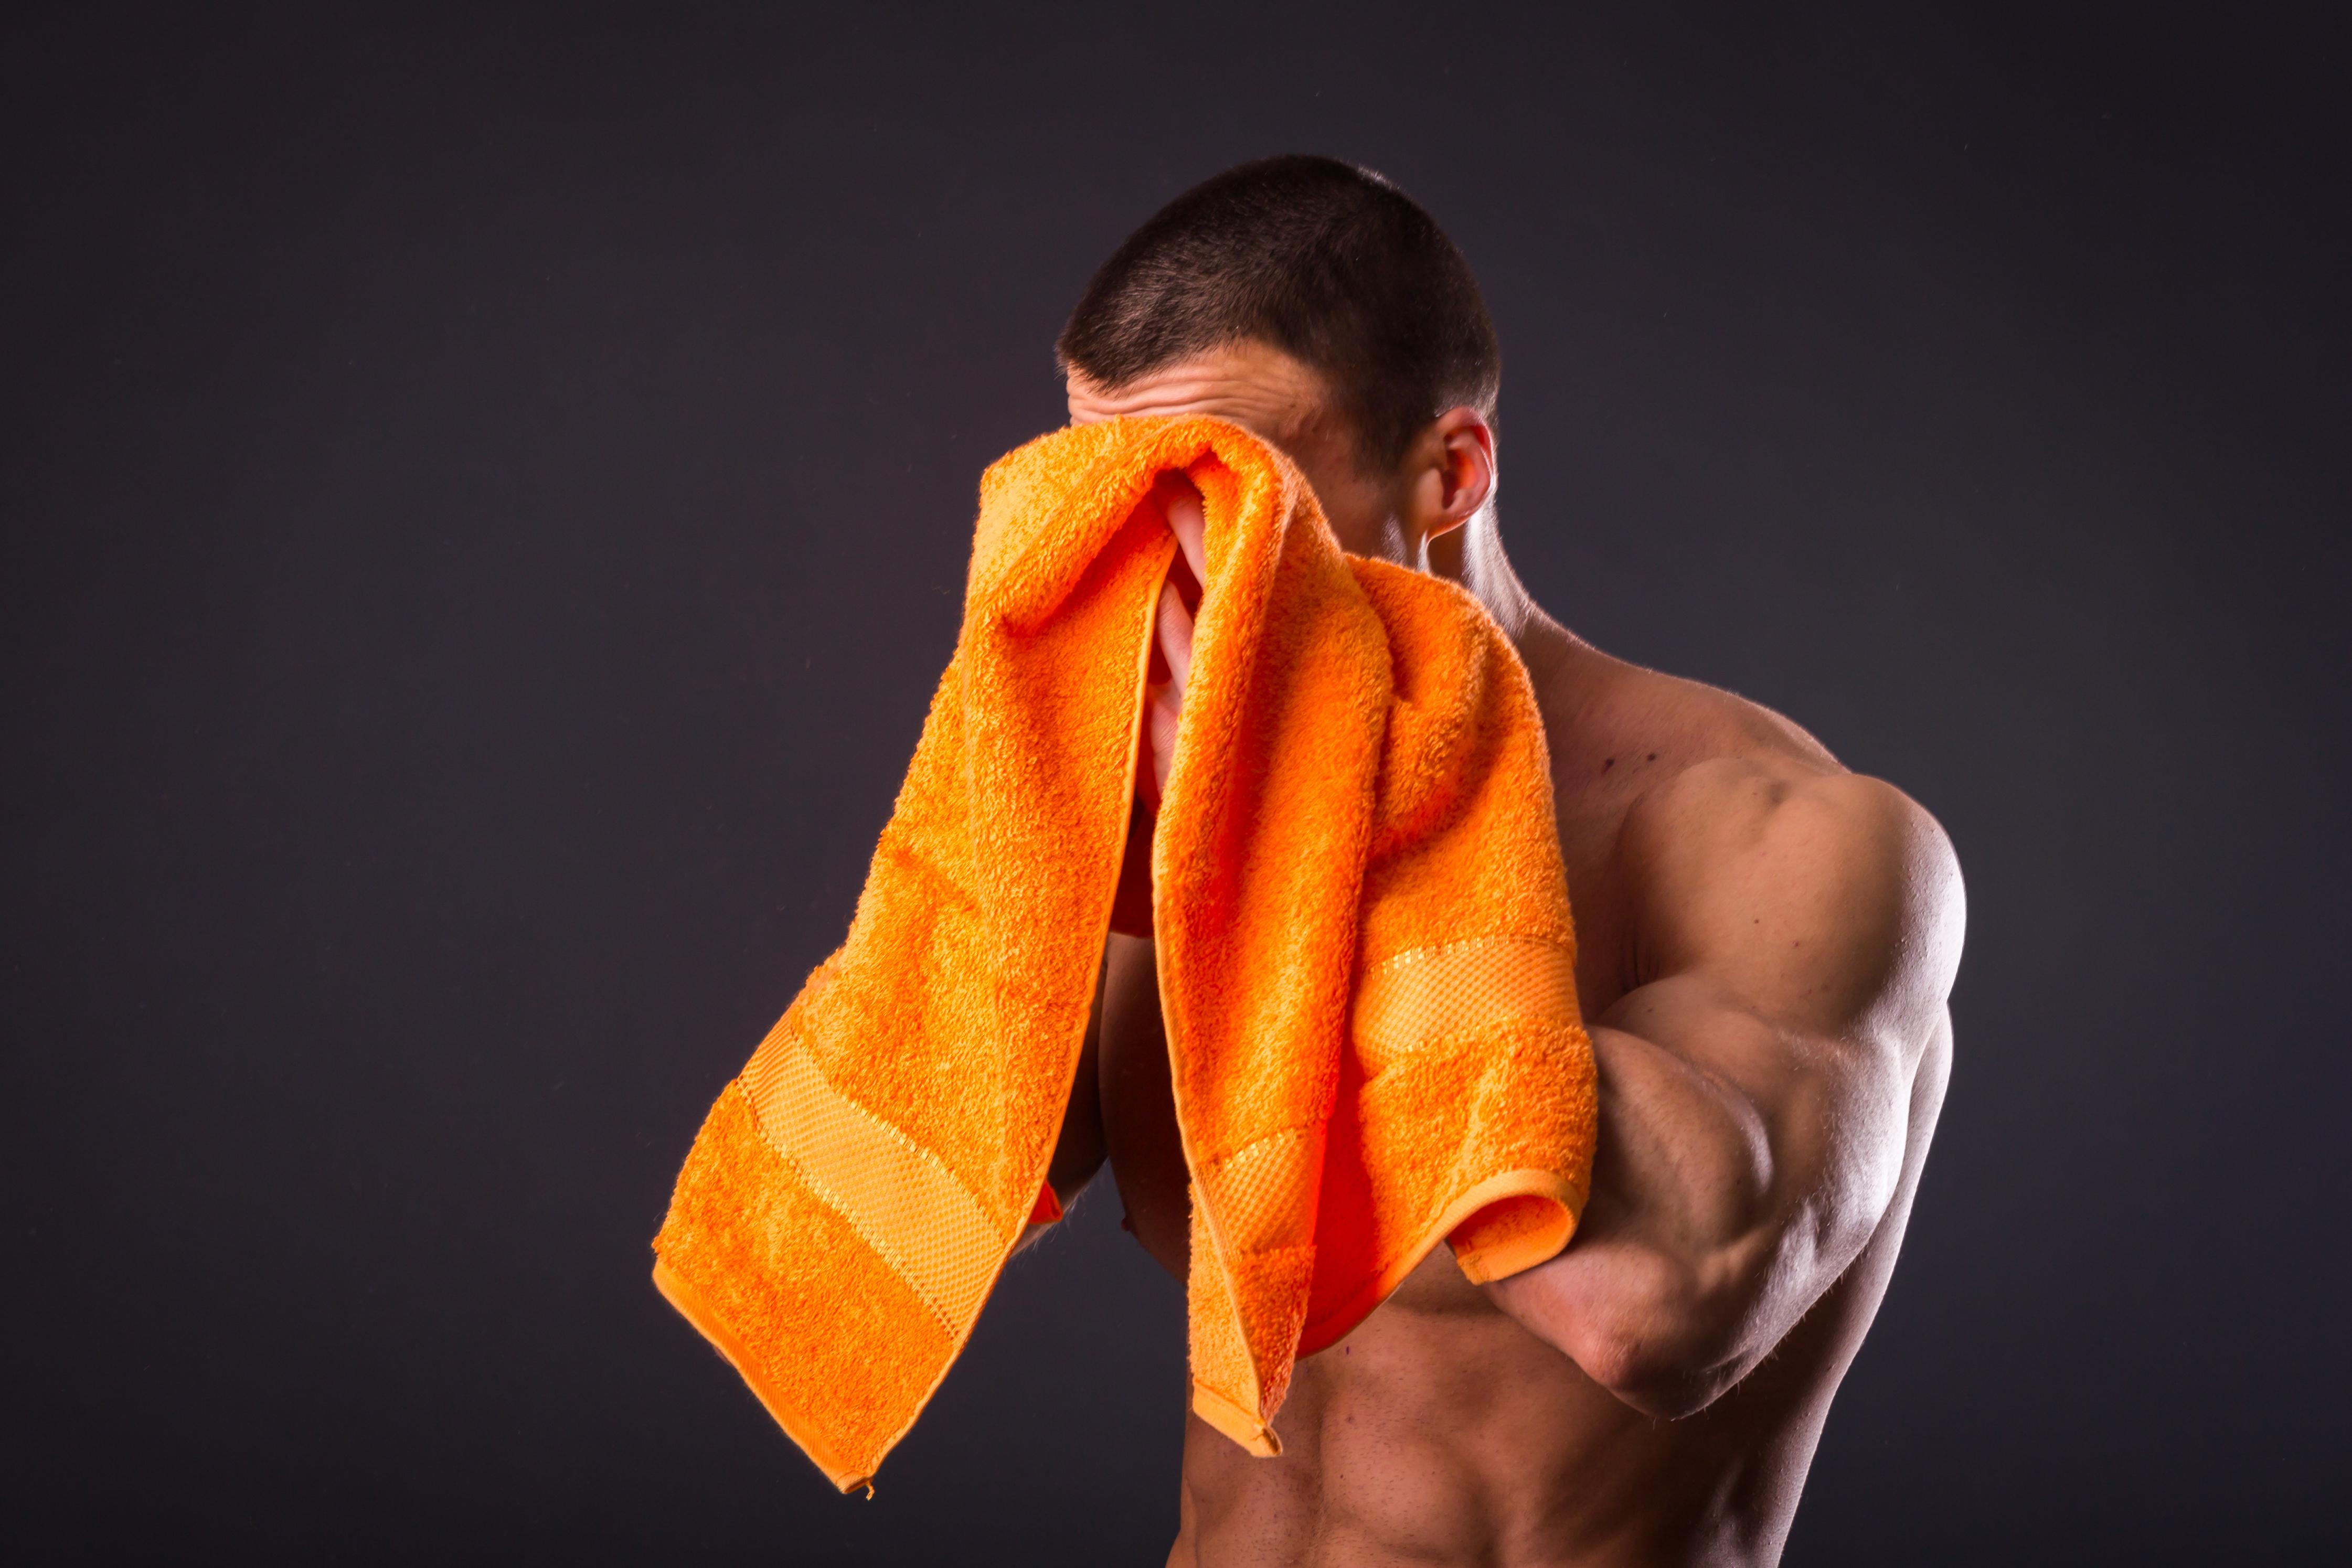 Plain dyed sports towels